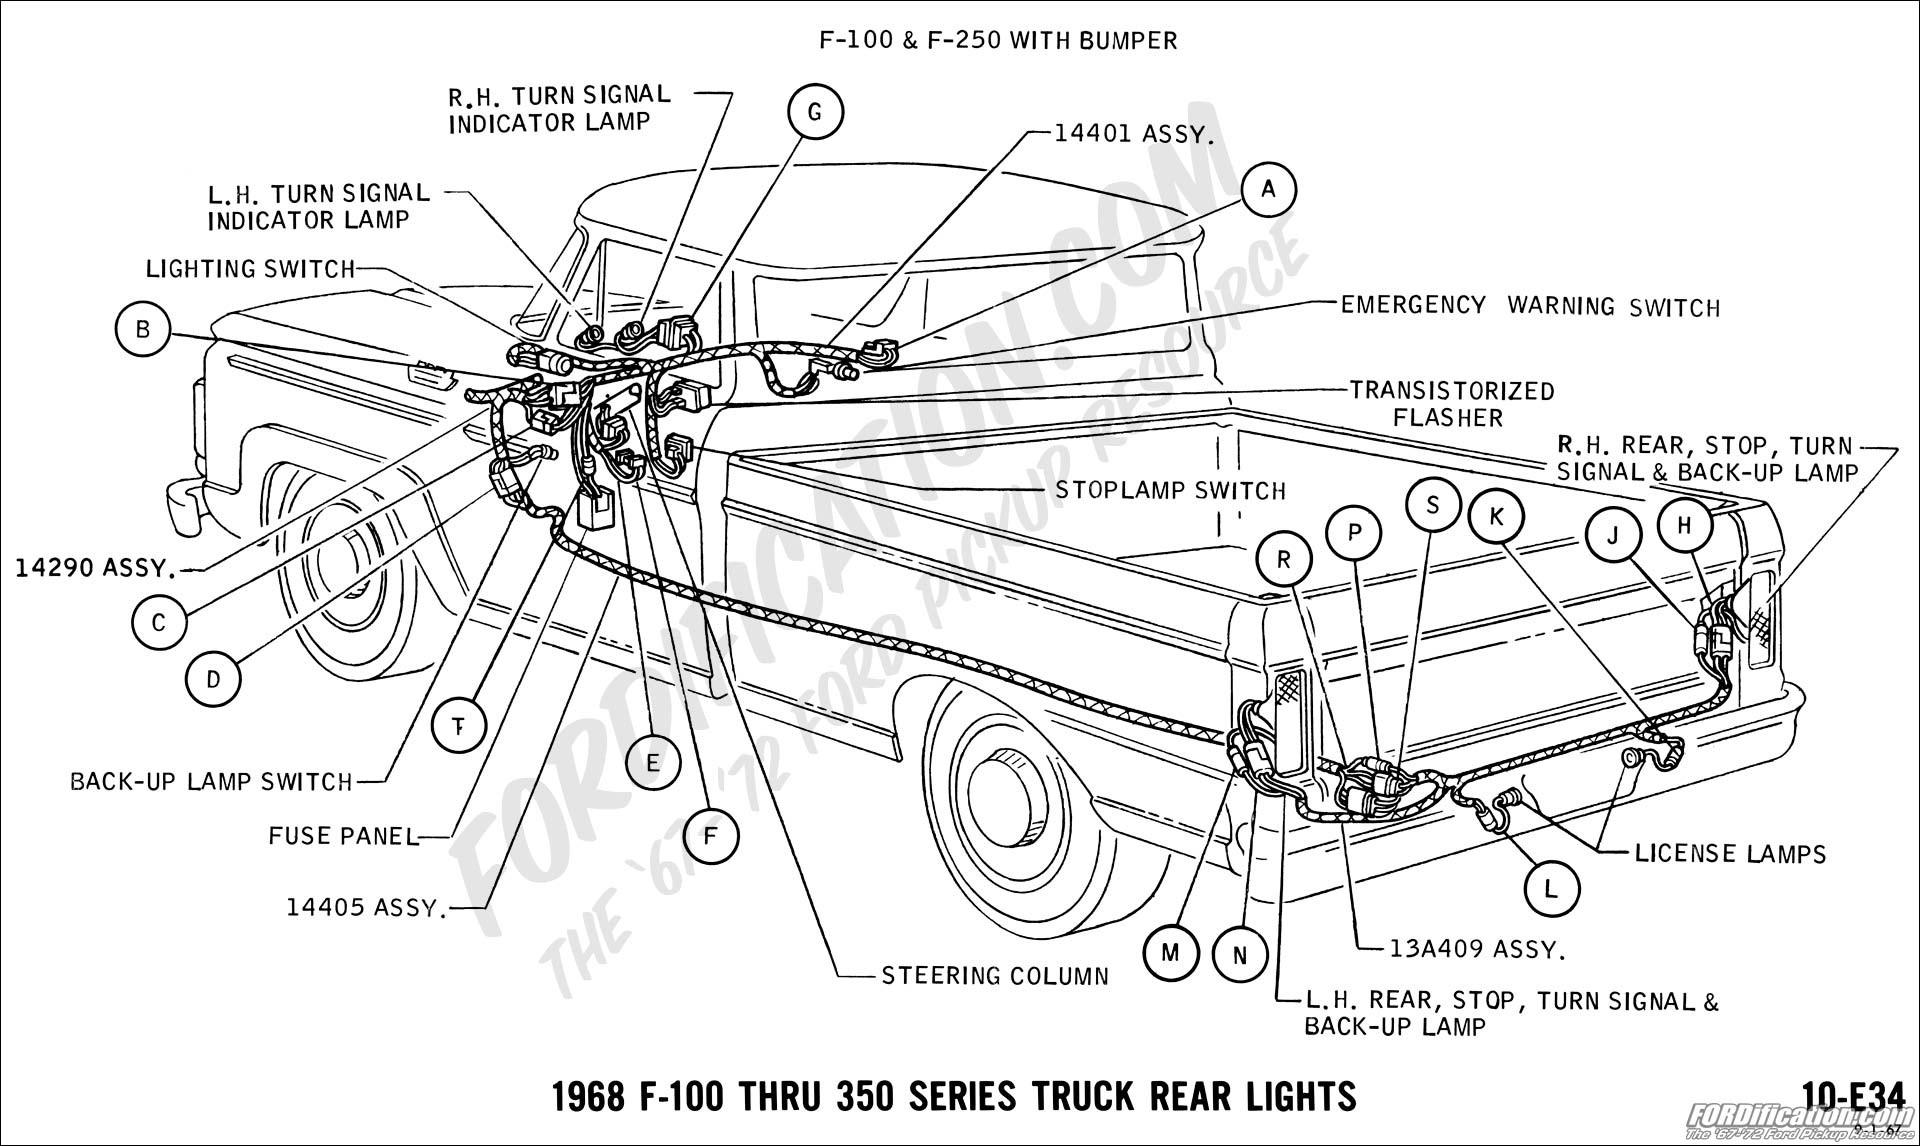 1996 toyota tacoma parts diagram jeep jk wiring 4r100 transmission valve